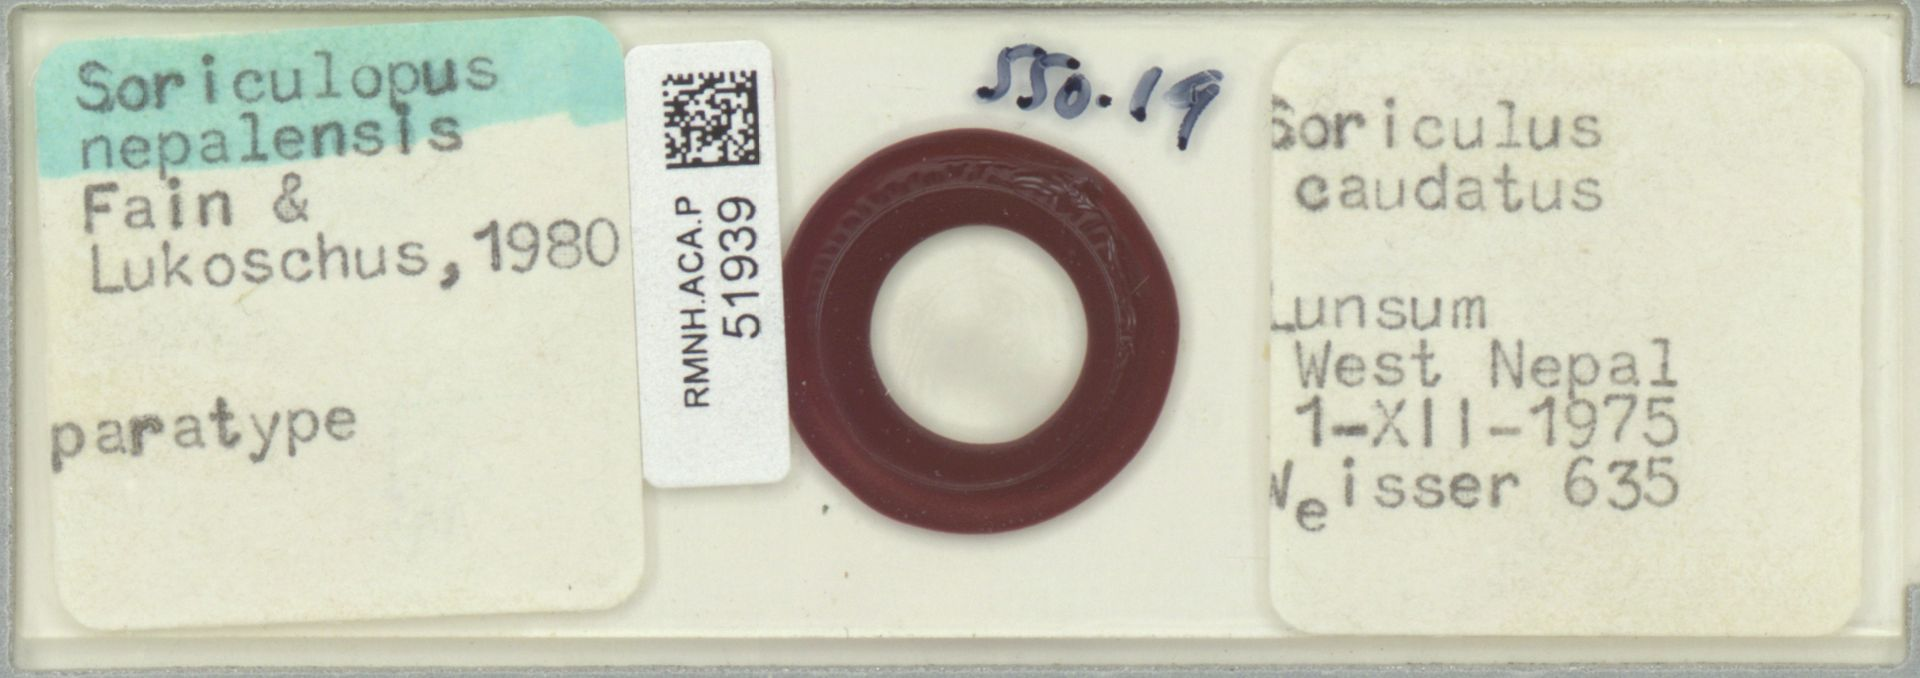 RMNH.ACA.P.51939 | Soriculopus nepalensis Fain & Lukoschus 1980